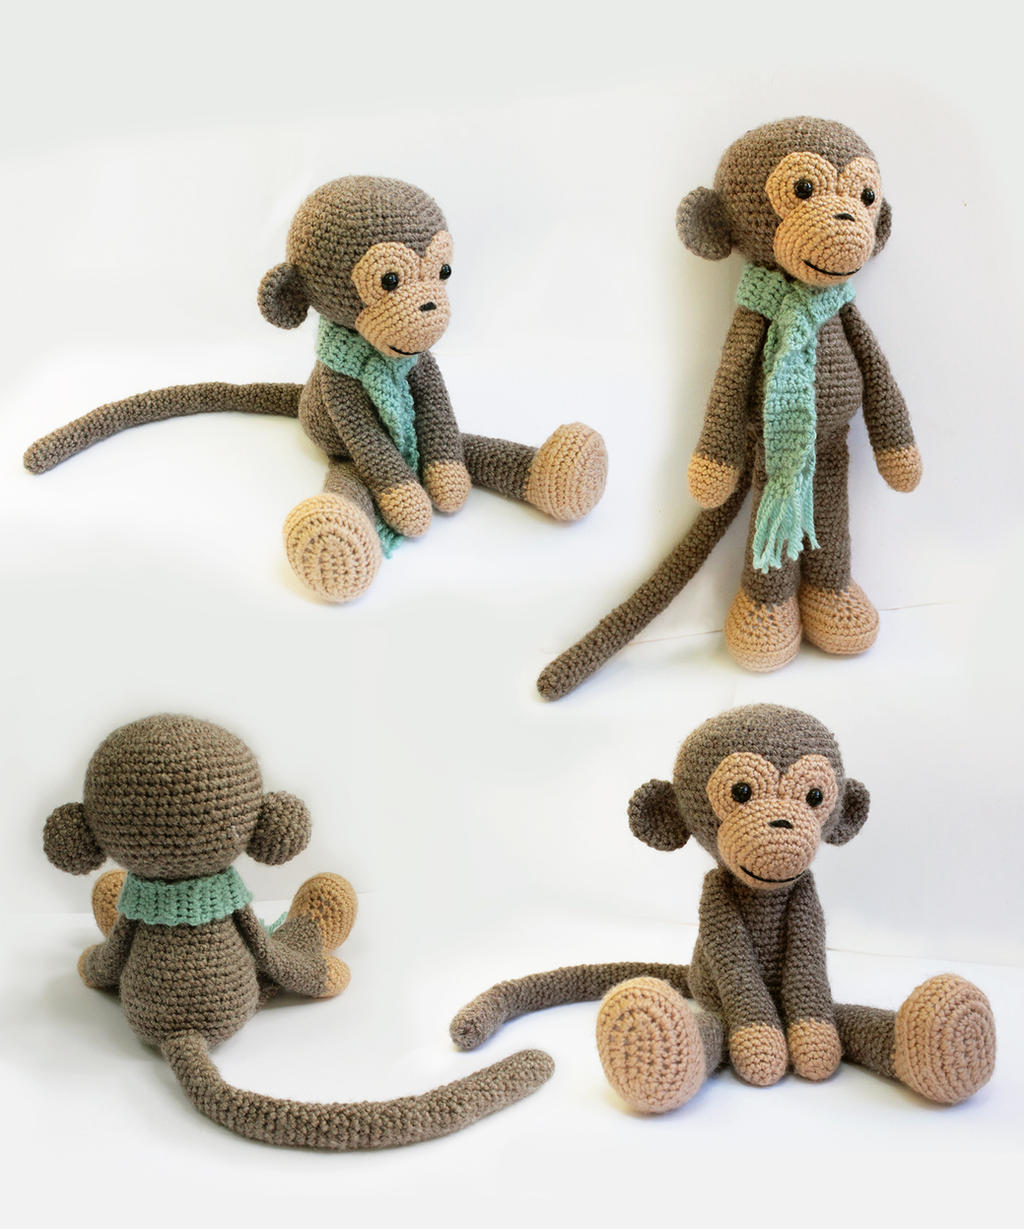 Amigurumi Monkey Pattern By Anattzach On Deviantart